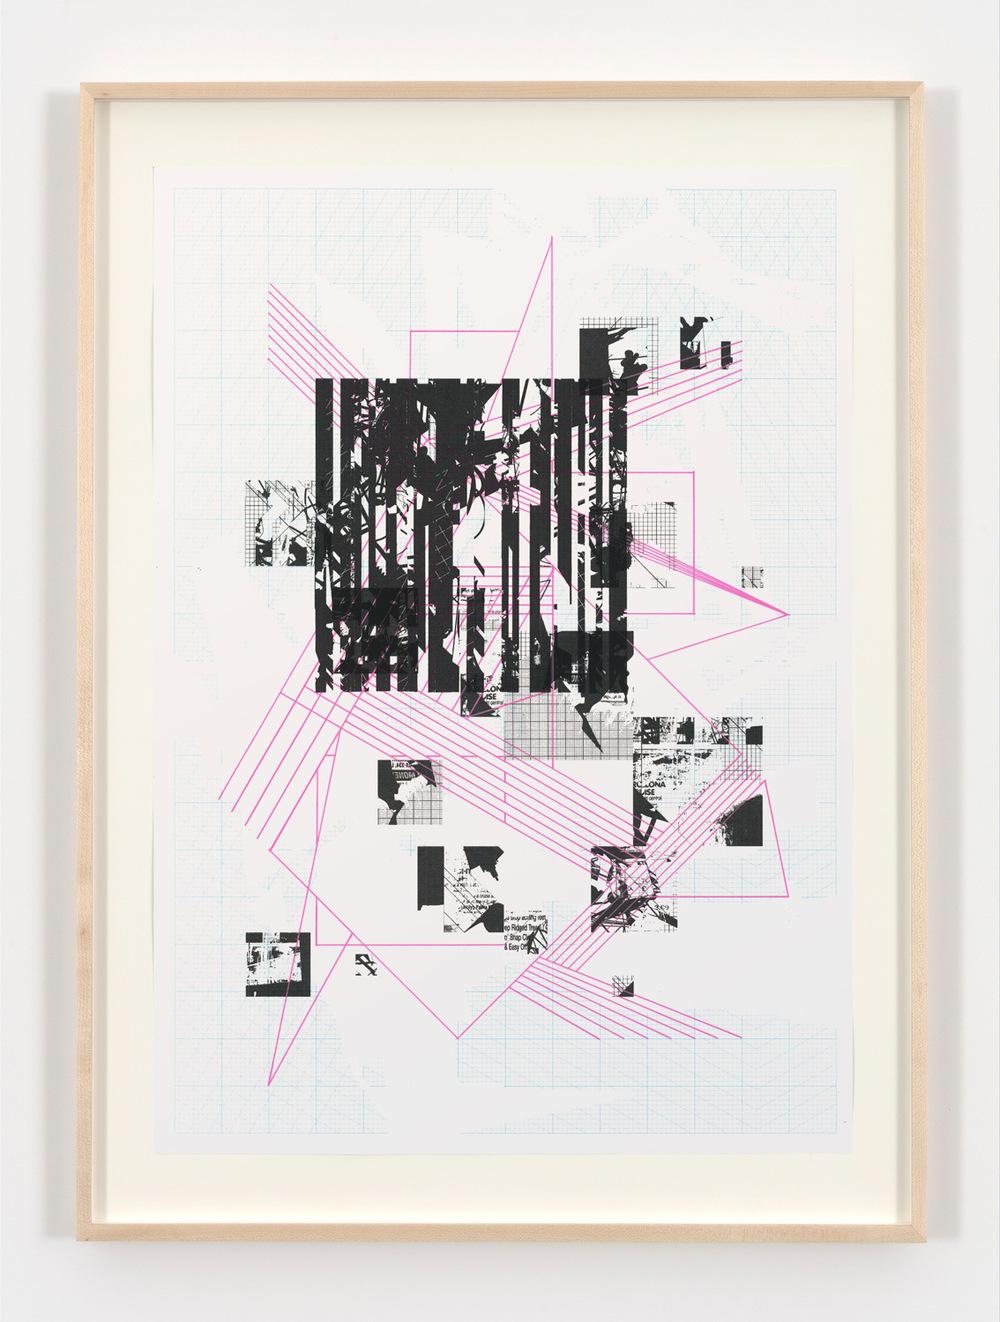 Tom Tebby Visual Artist - UntitledPosca pen, digital print on custom made graph paper